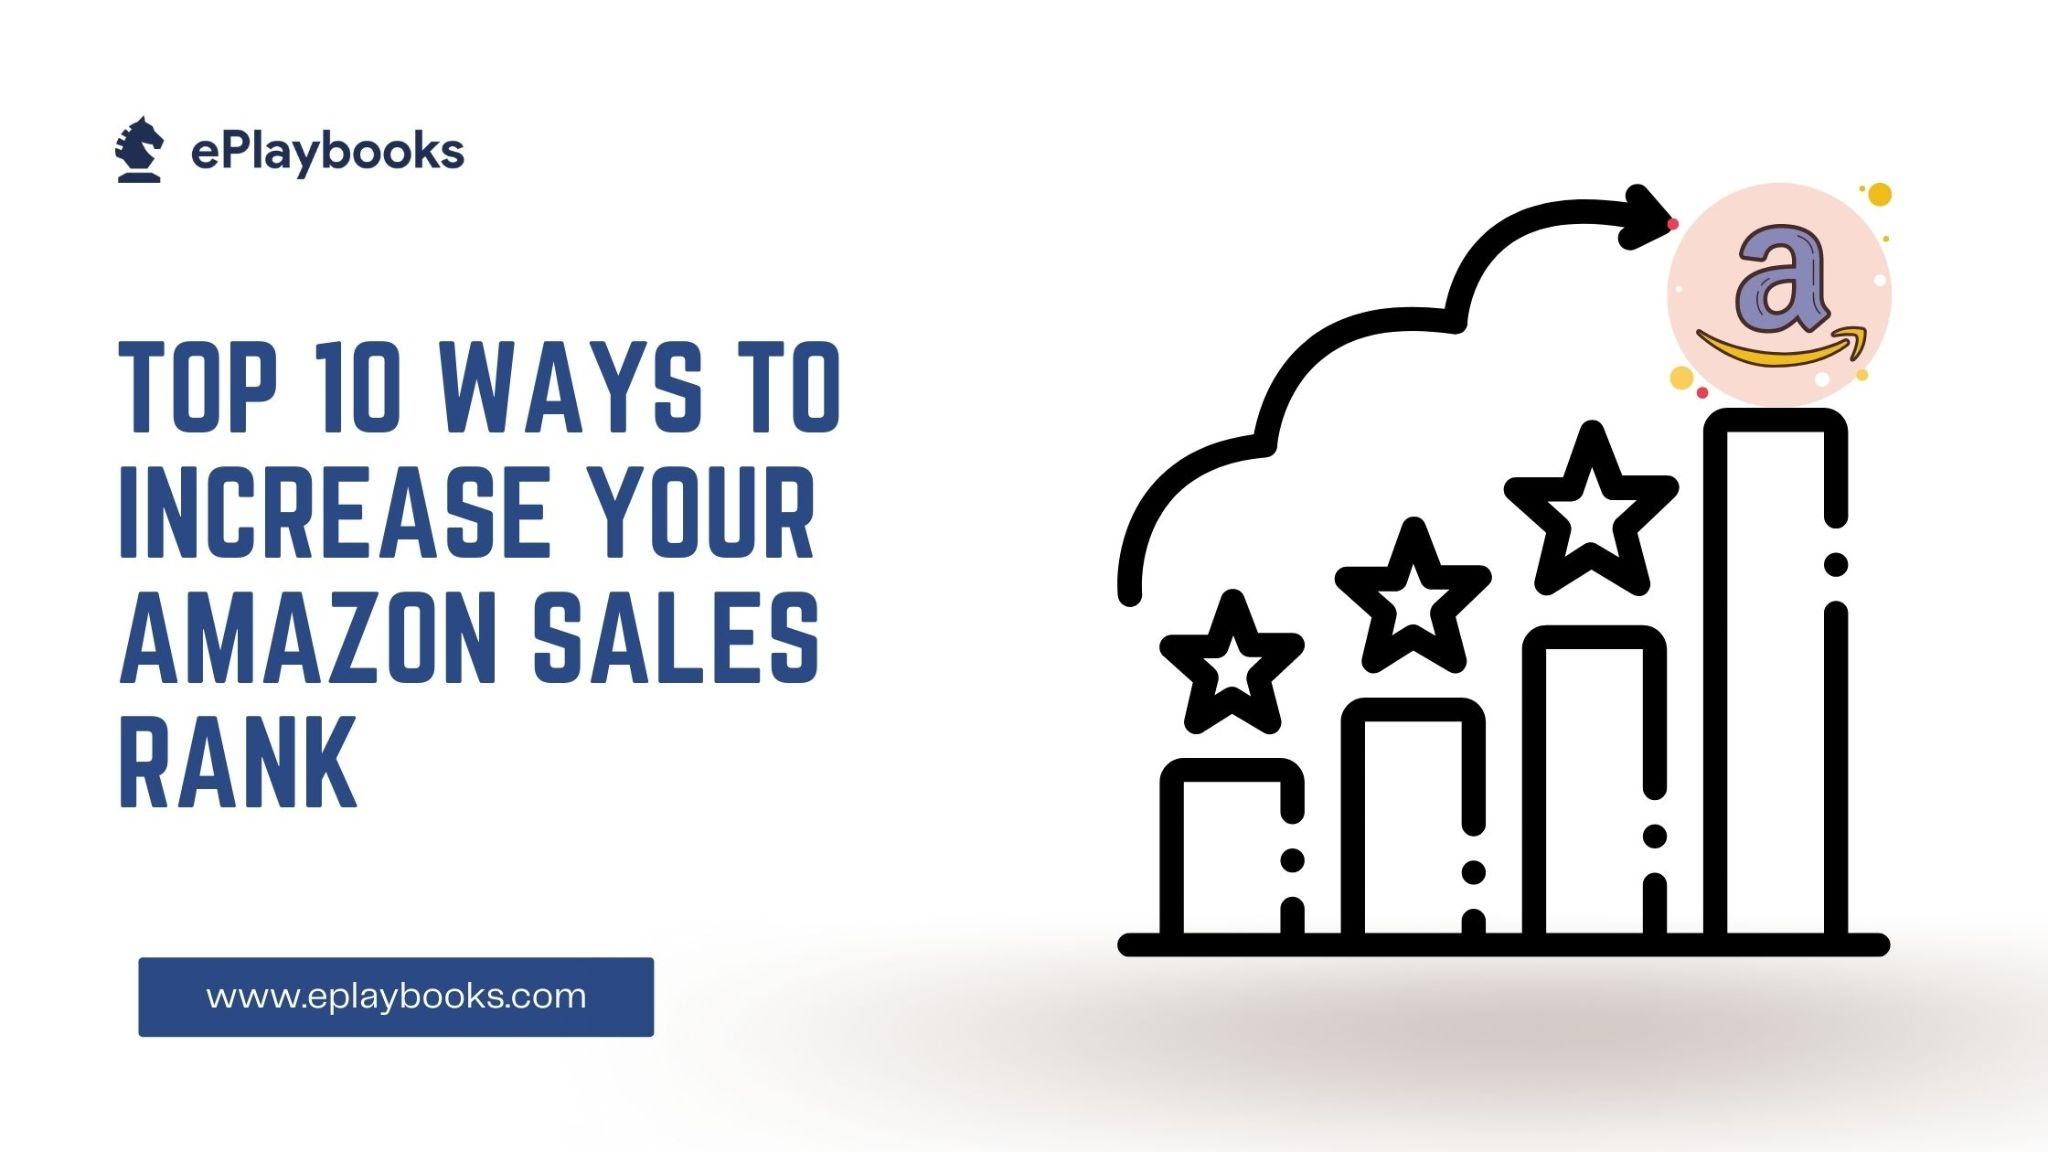 Top 10 ways to increase your Amazon sales rank